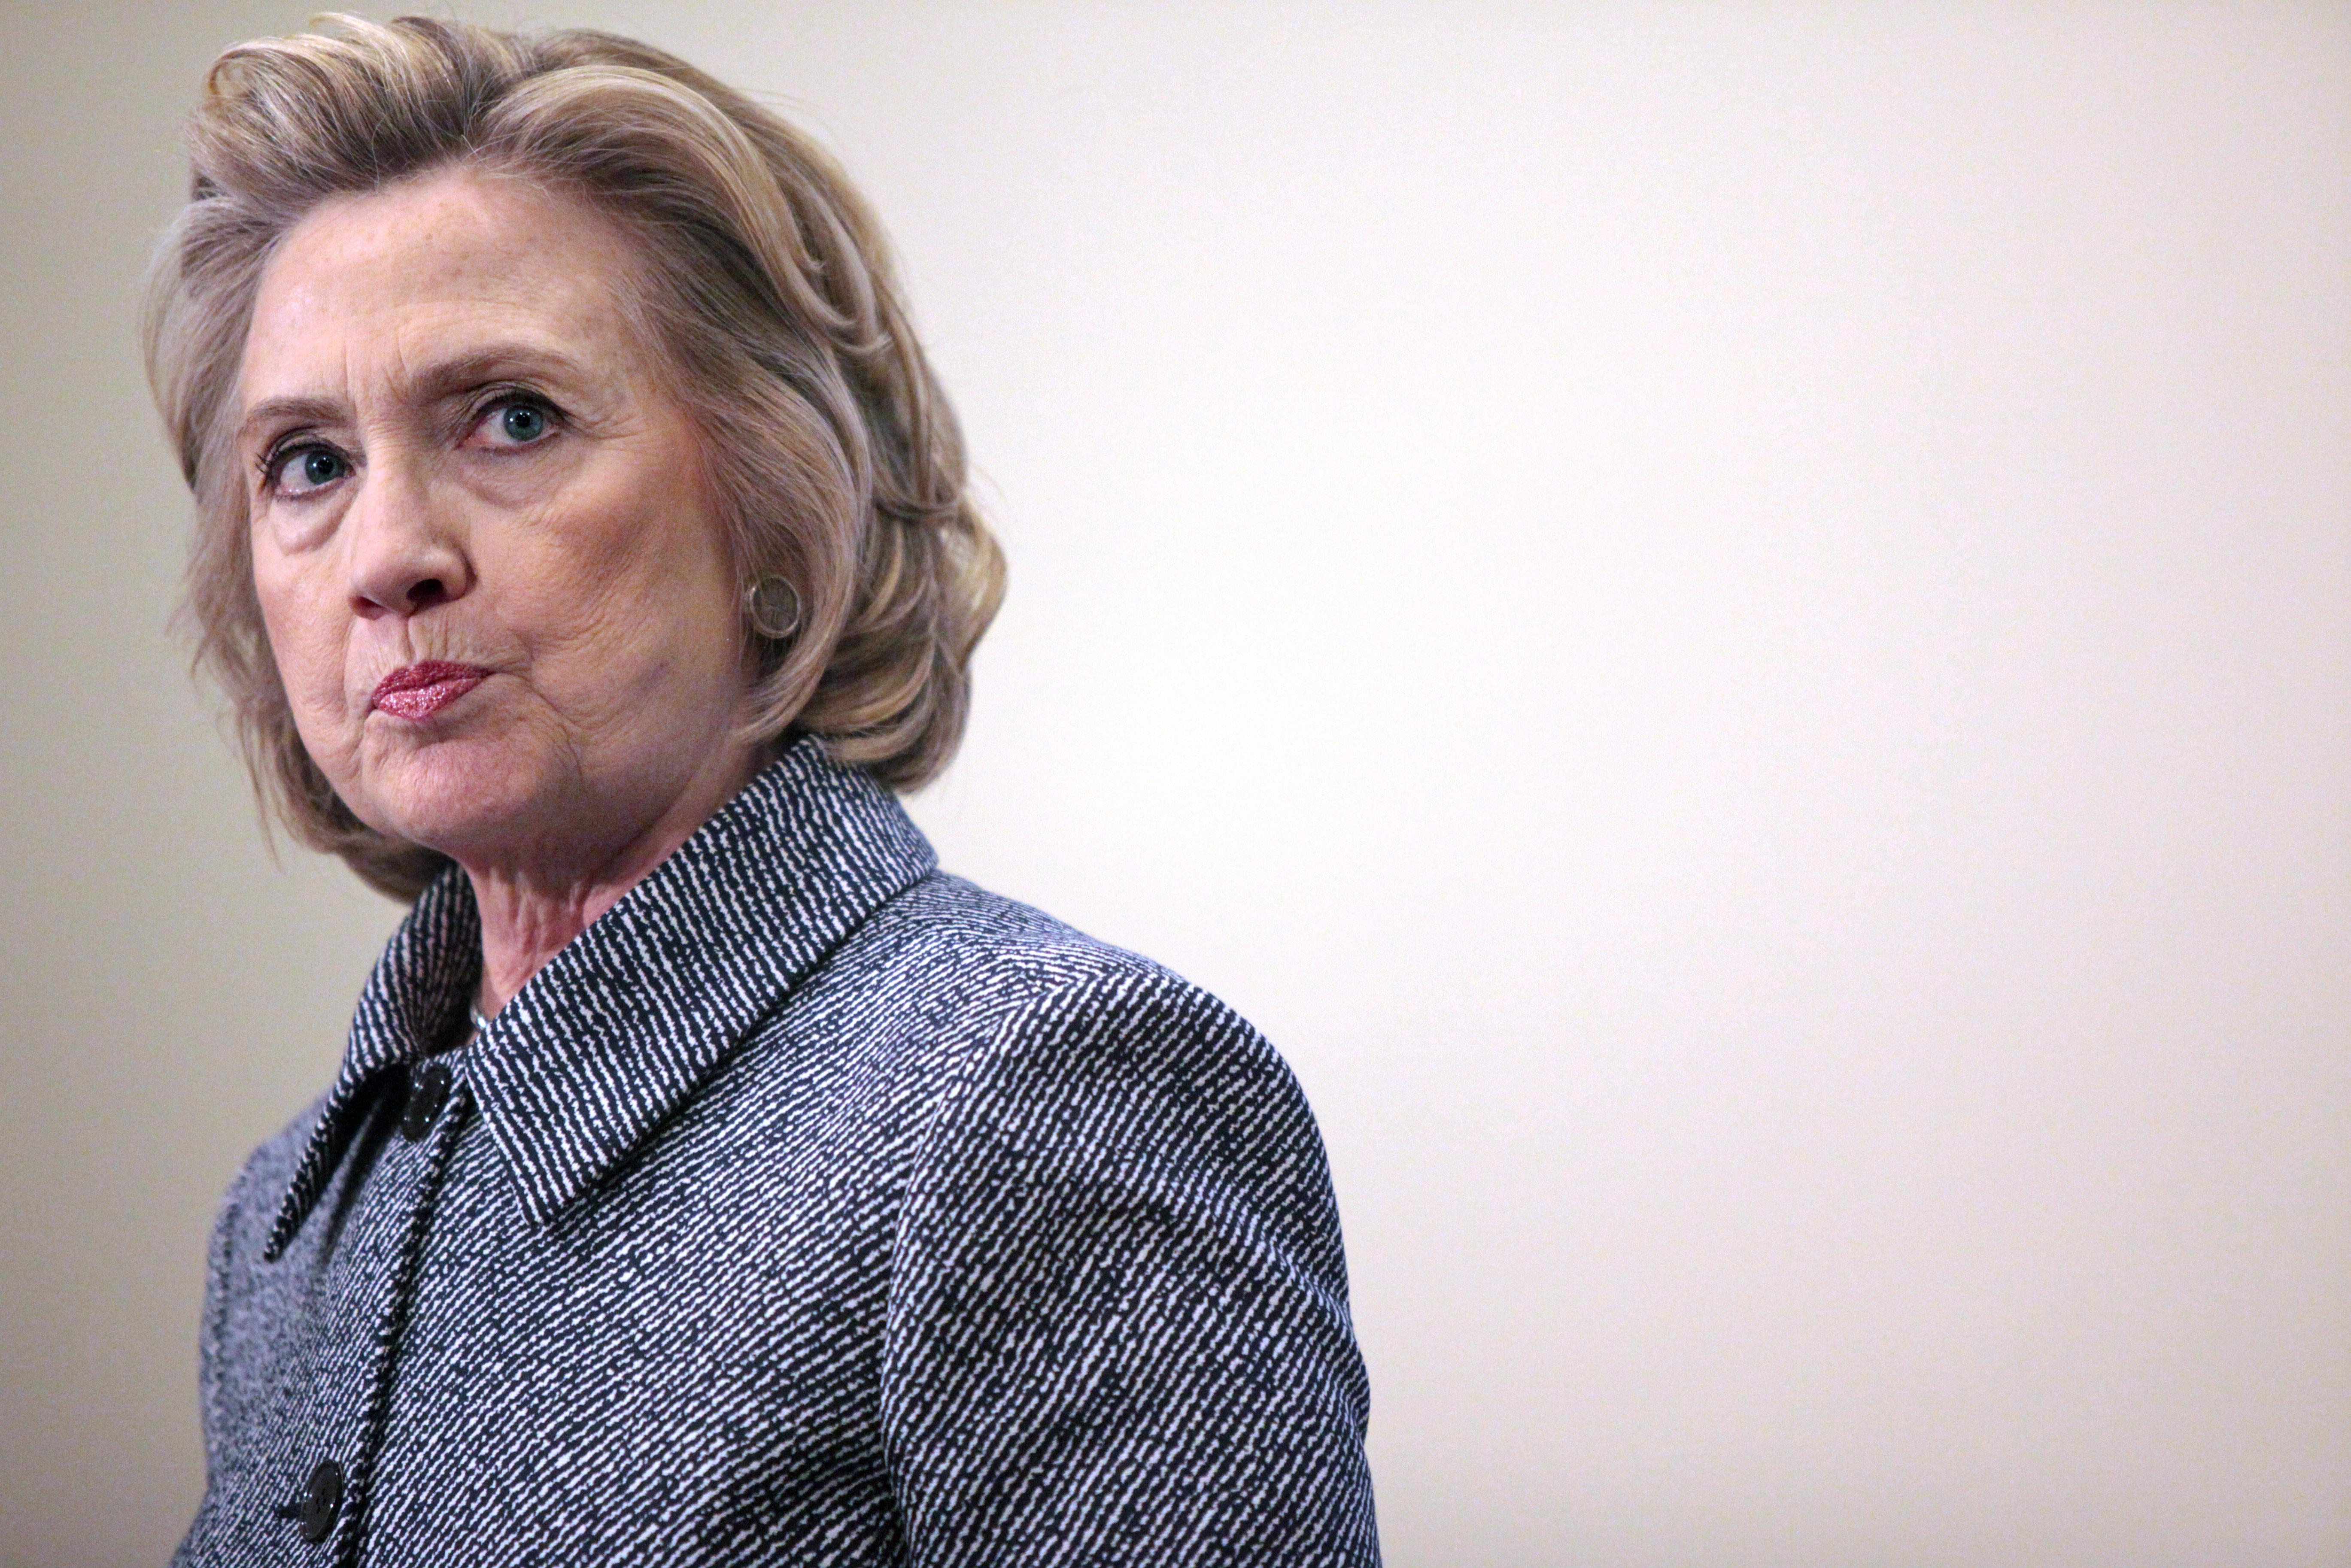 Hillary clinton et gratuit ghetto noir@todorazor.com